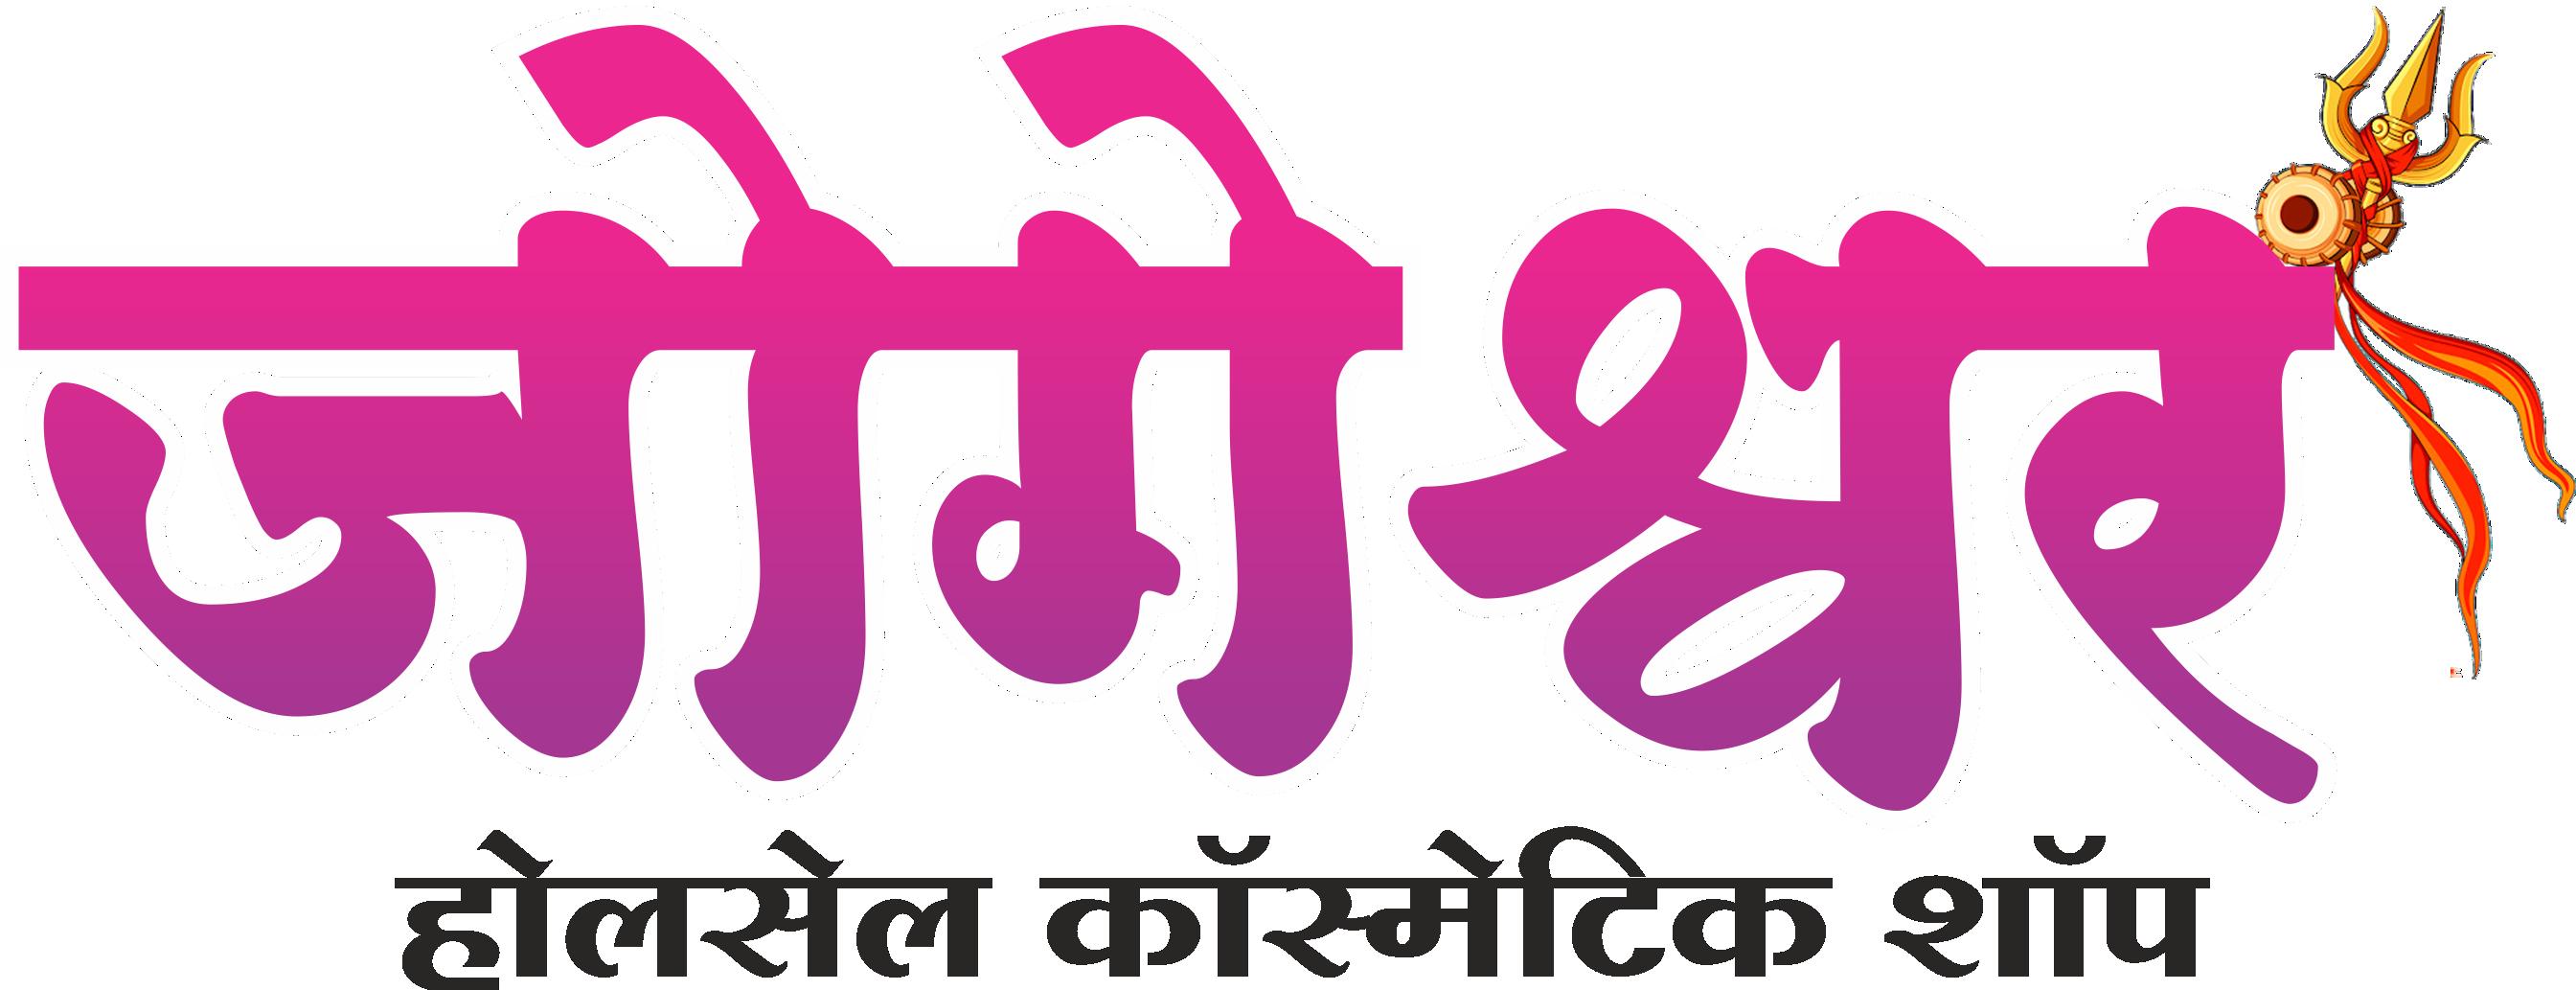 Jogeshwar Cosmetic Shop Share Business Card